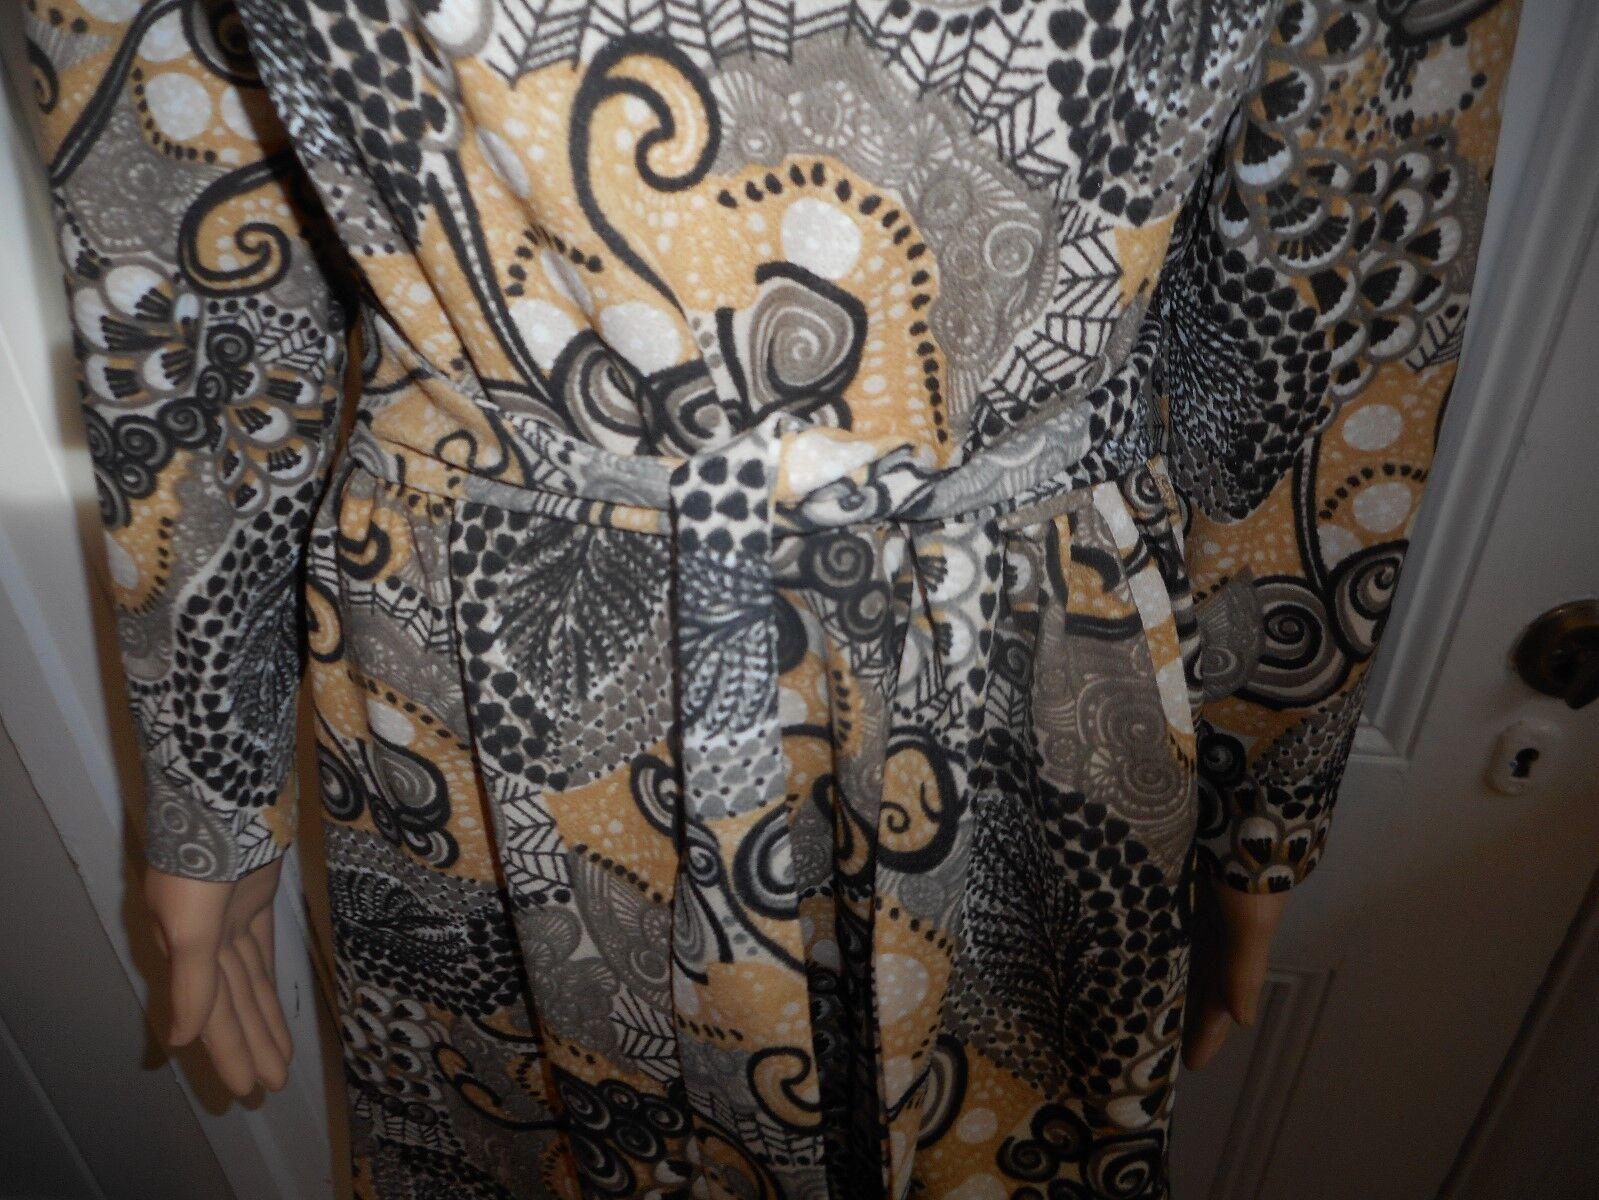 Vintage Sacony Exclusive Dress With Belt - image 2